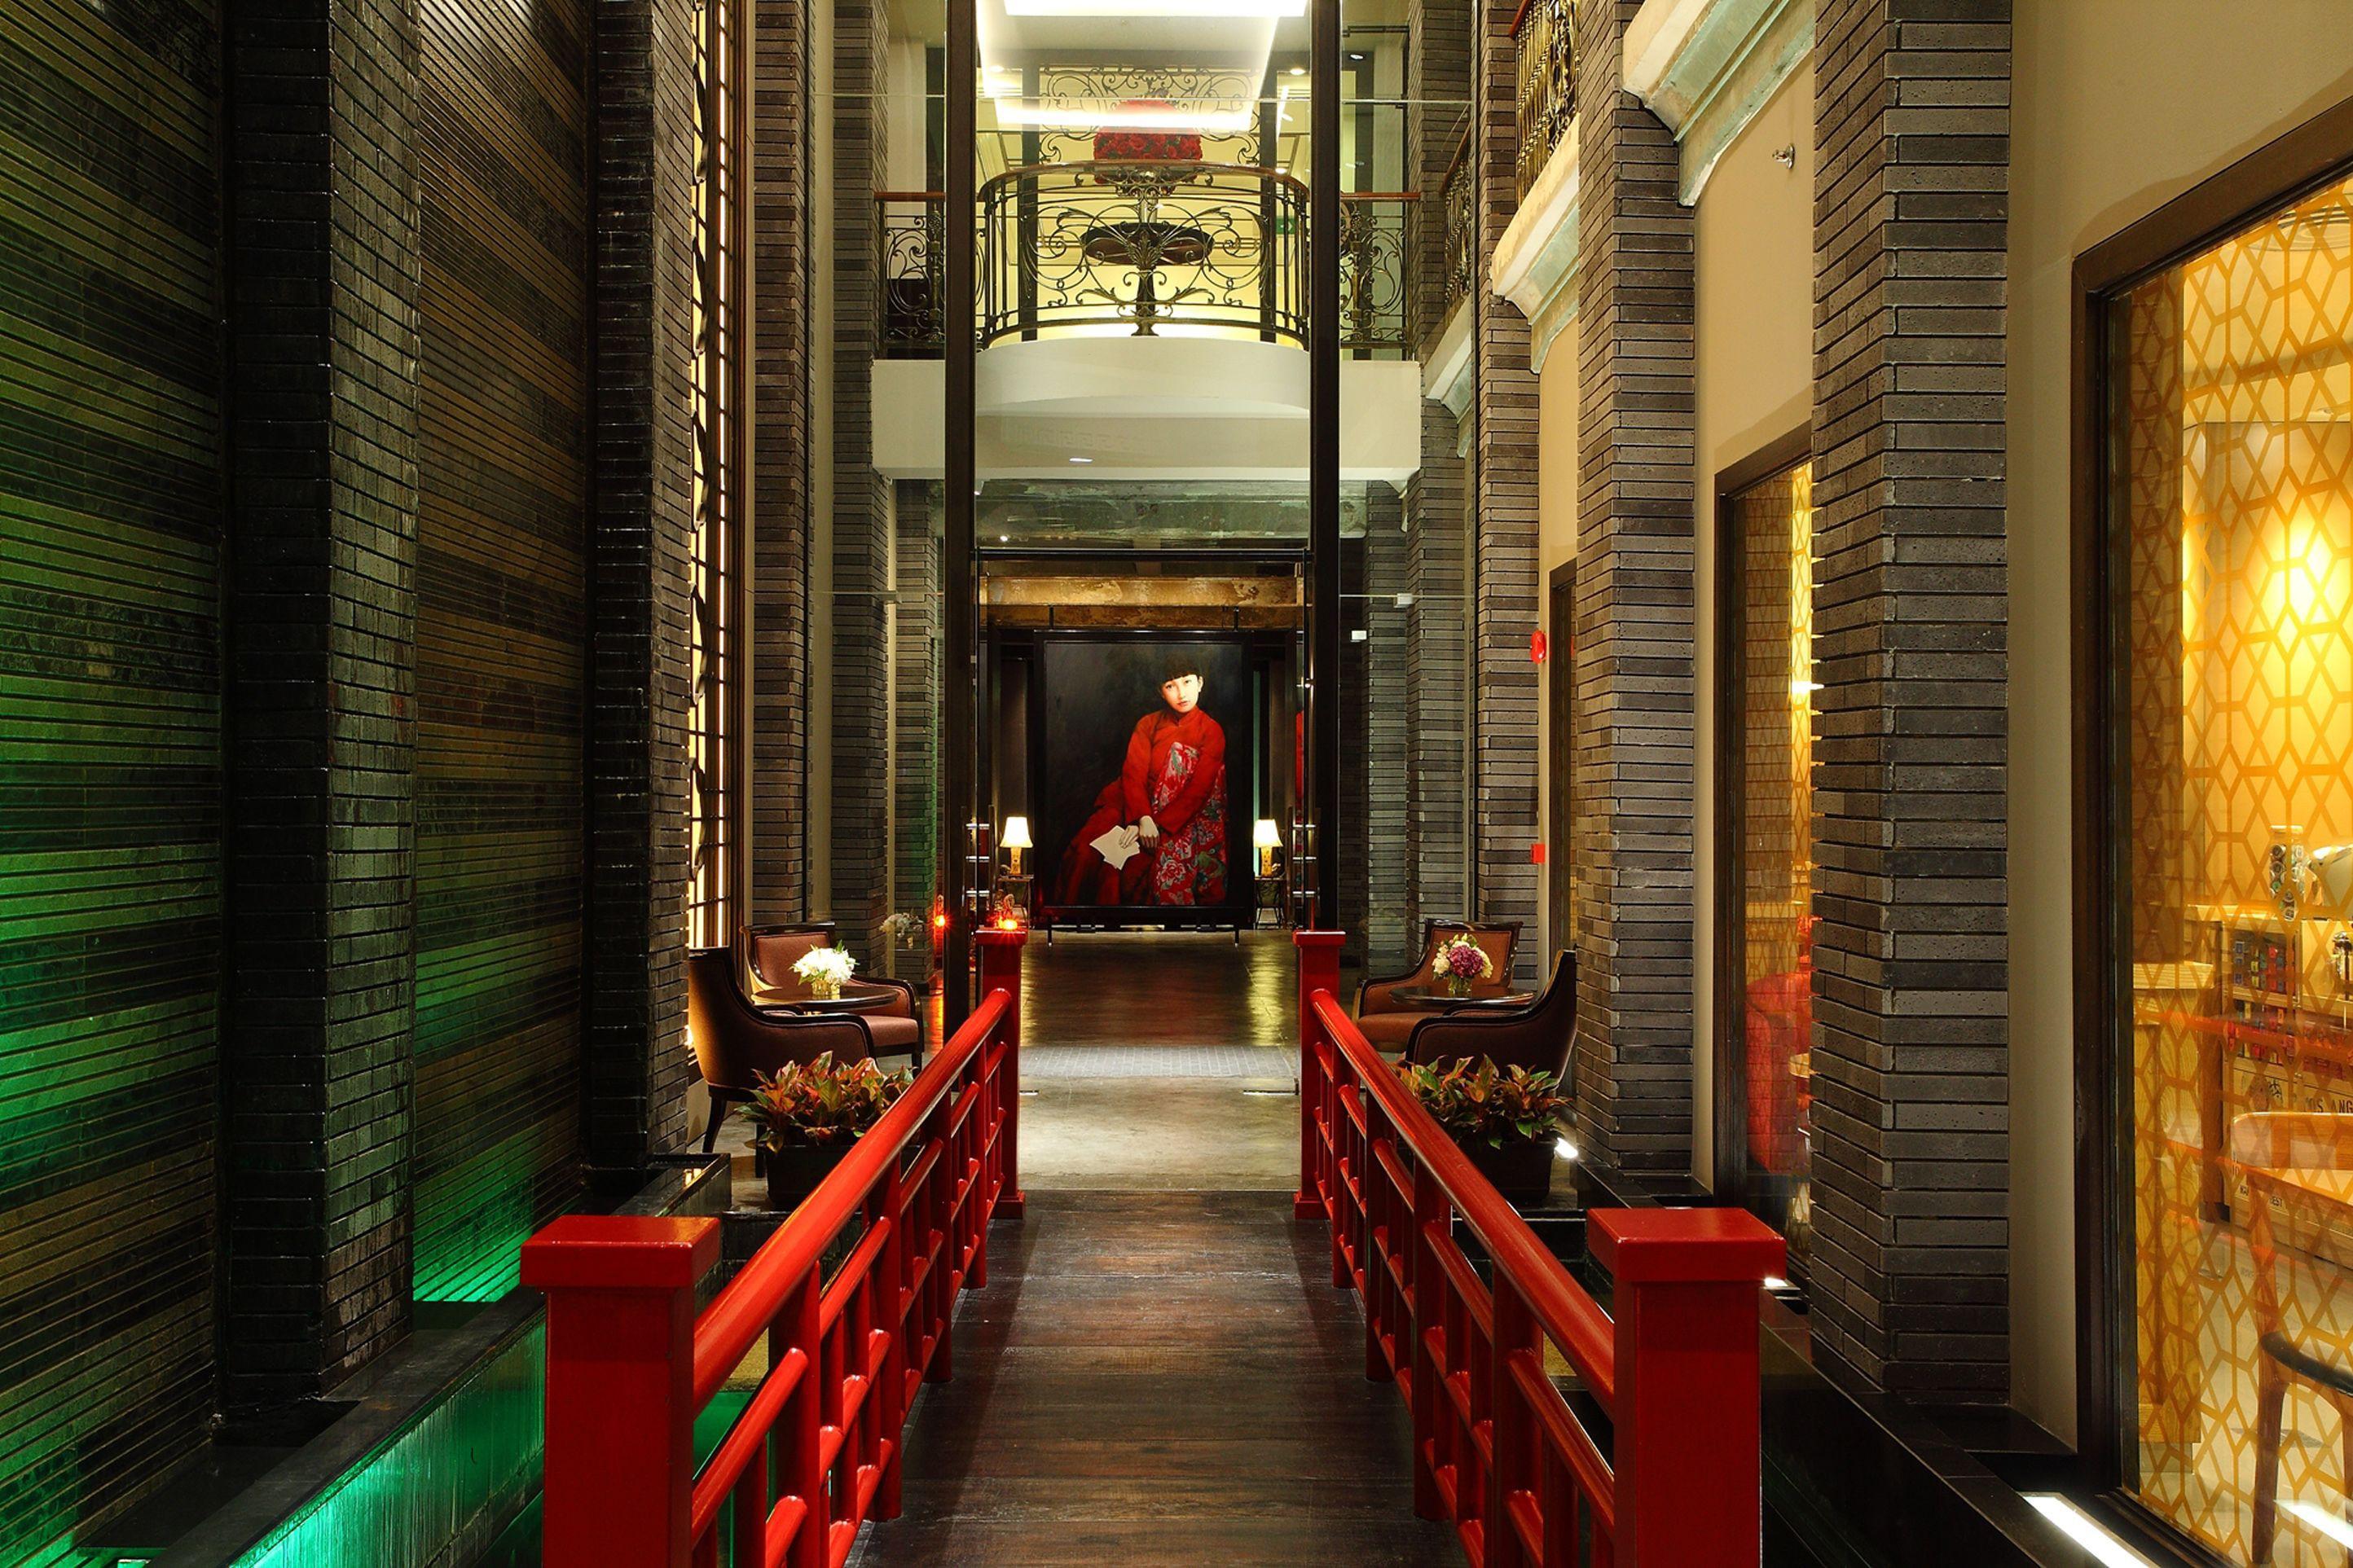 Courtesy of Shanghai Mansion / Expedia